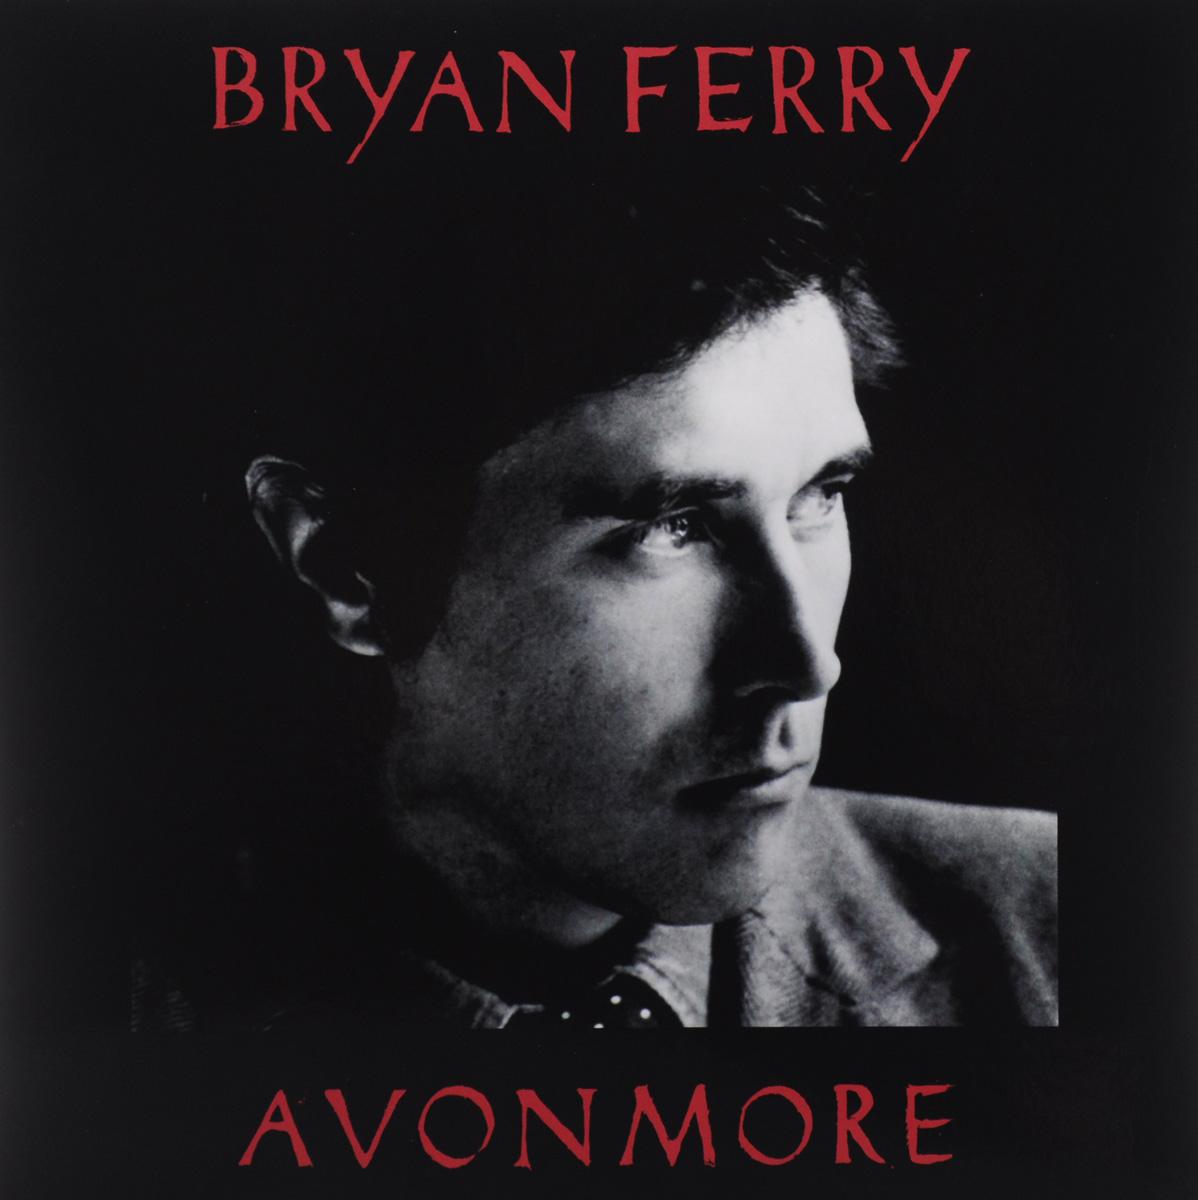 Брайан Ферри Bryan Ferry. Avonmore (LP) + CD partners lp cd